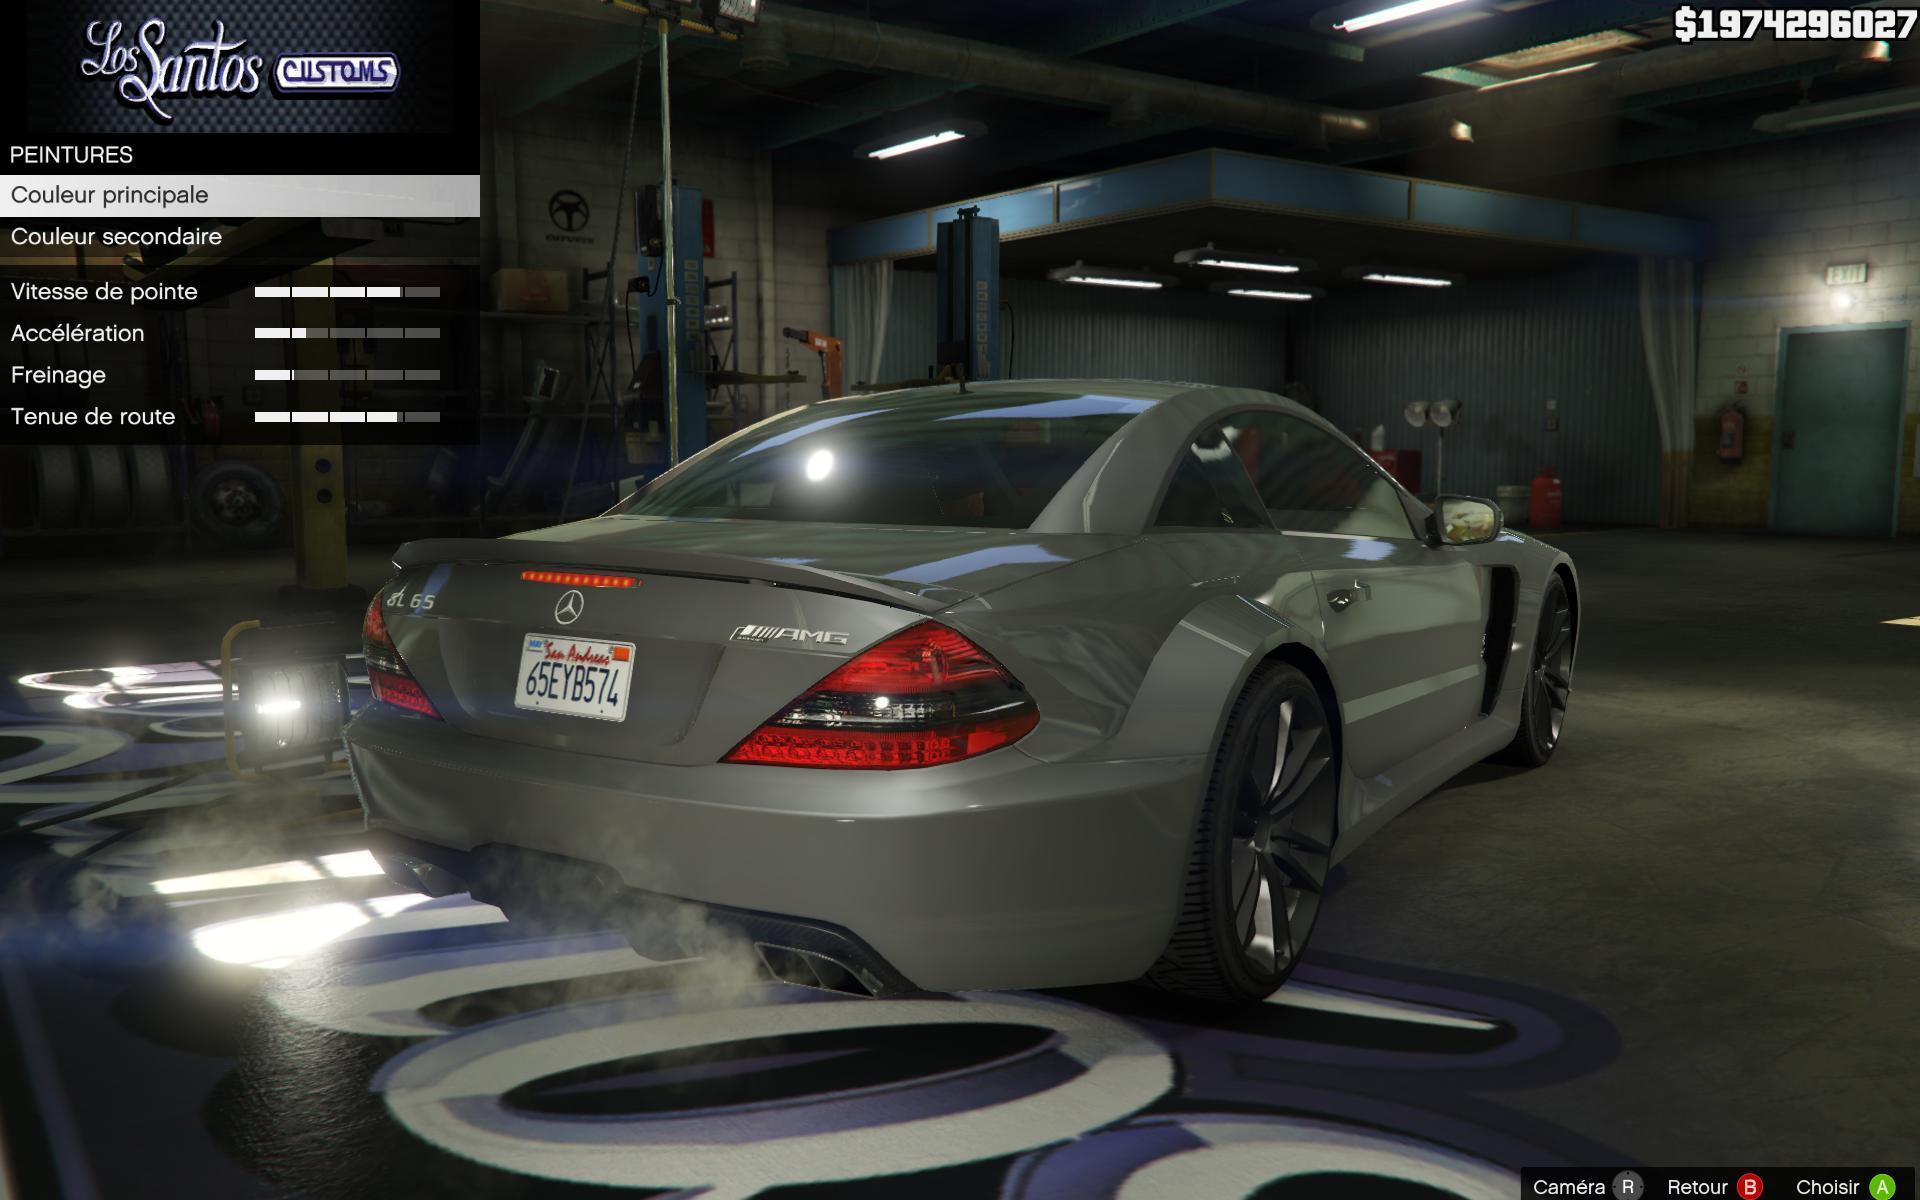 Spyshots Mercedes Cla Amg also Mercedes Benz Sls Amg Black Series moreover Amgr Wagonmercedes F also Ni D U furthermore A B. on mercedes sls amg black series